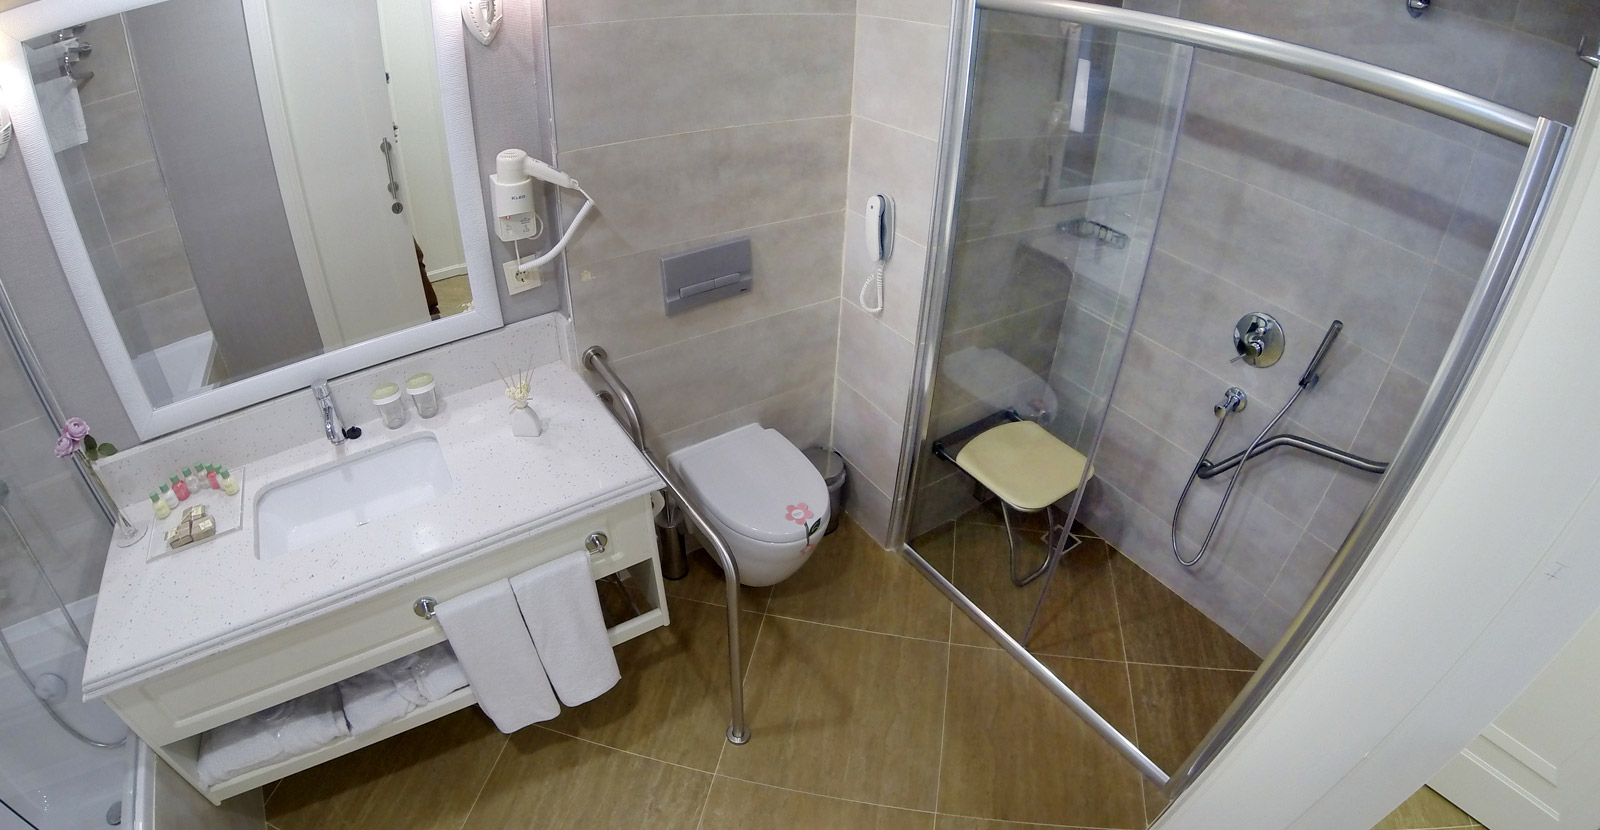 Handicap Accessible Hotel Room Requirements